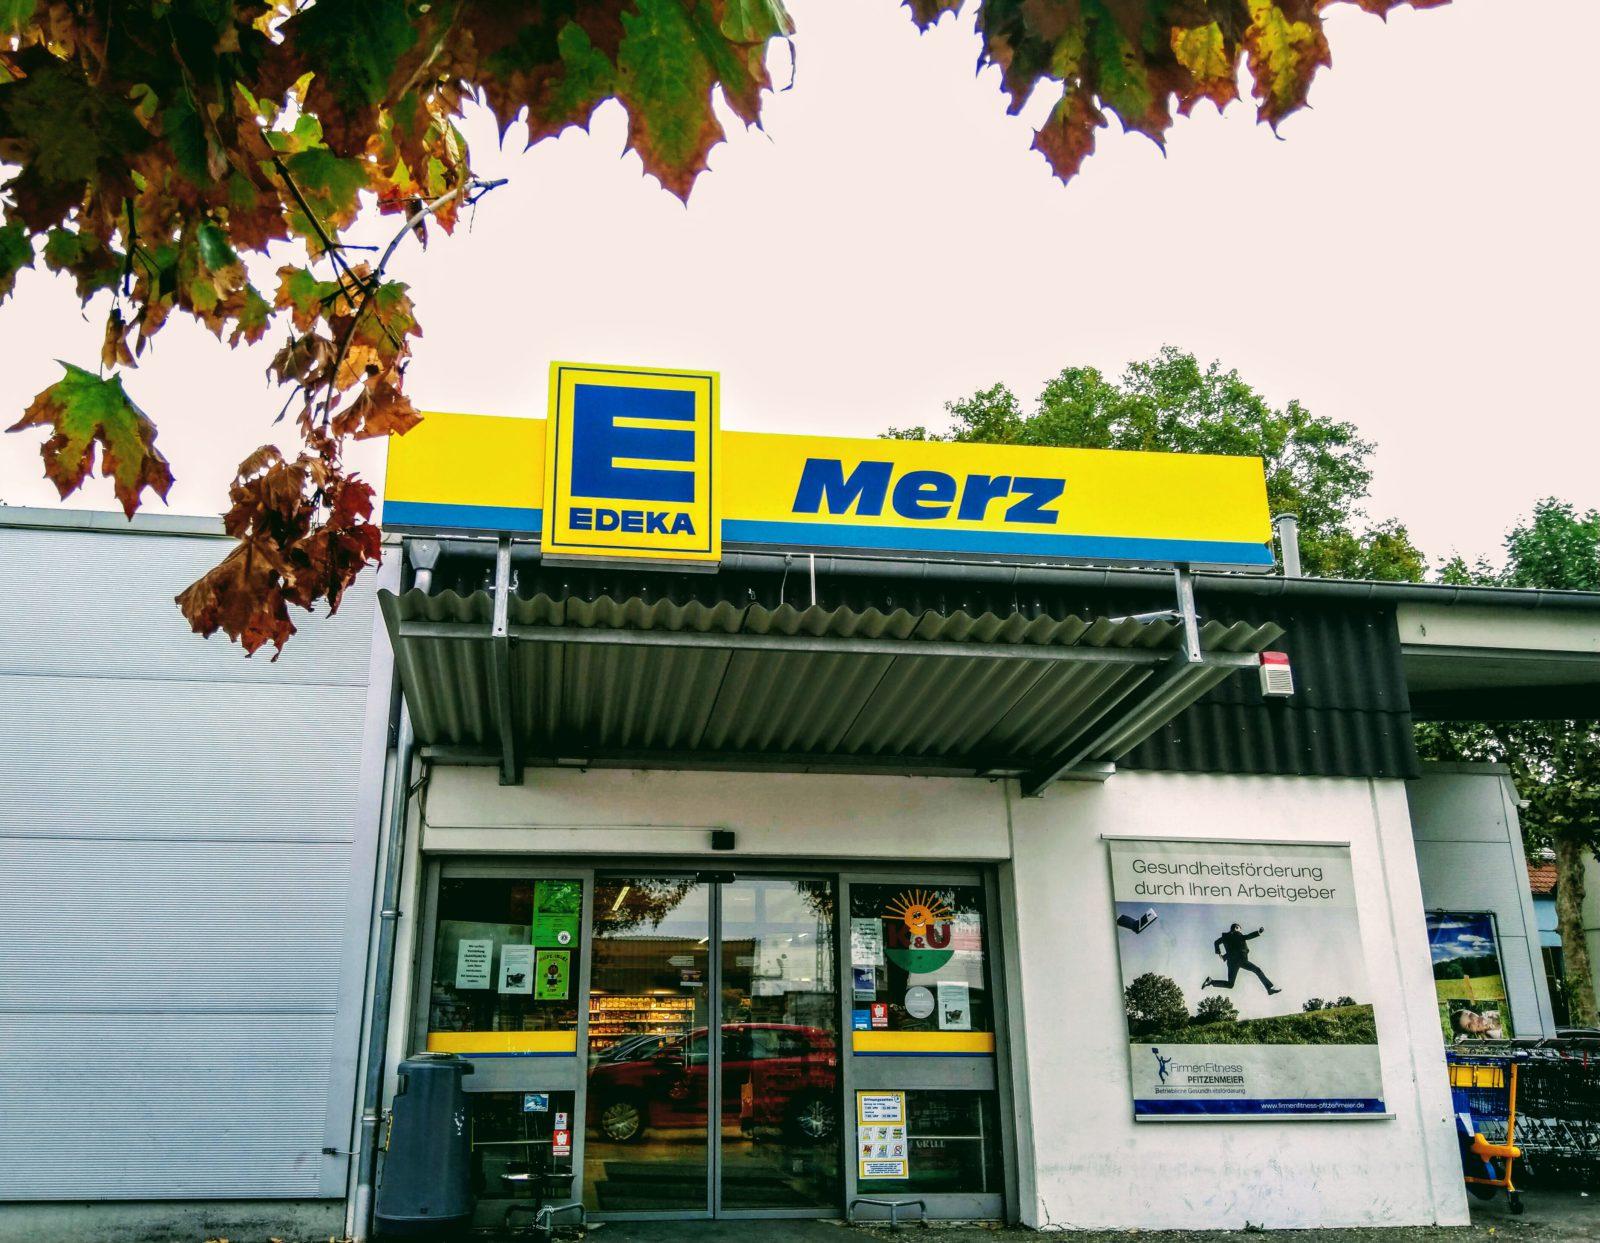 EDEKA Merz – Heppenheim